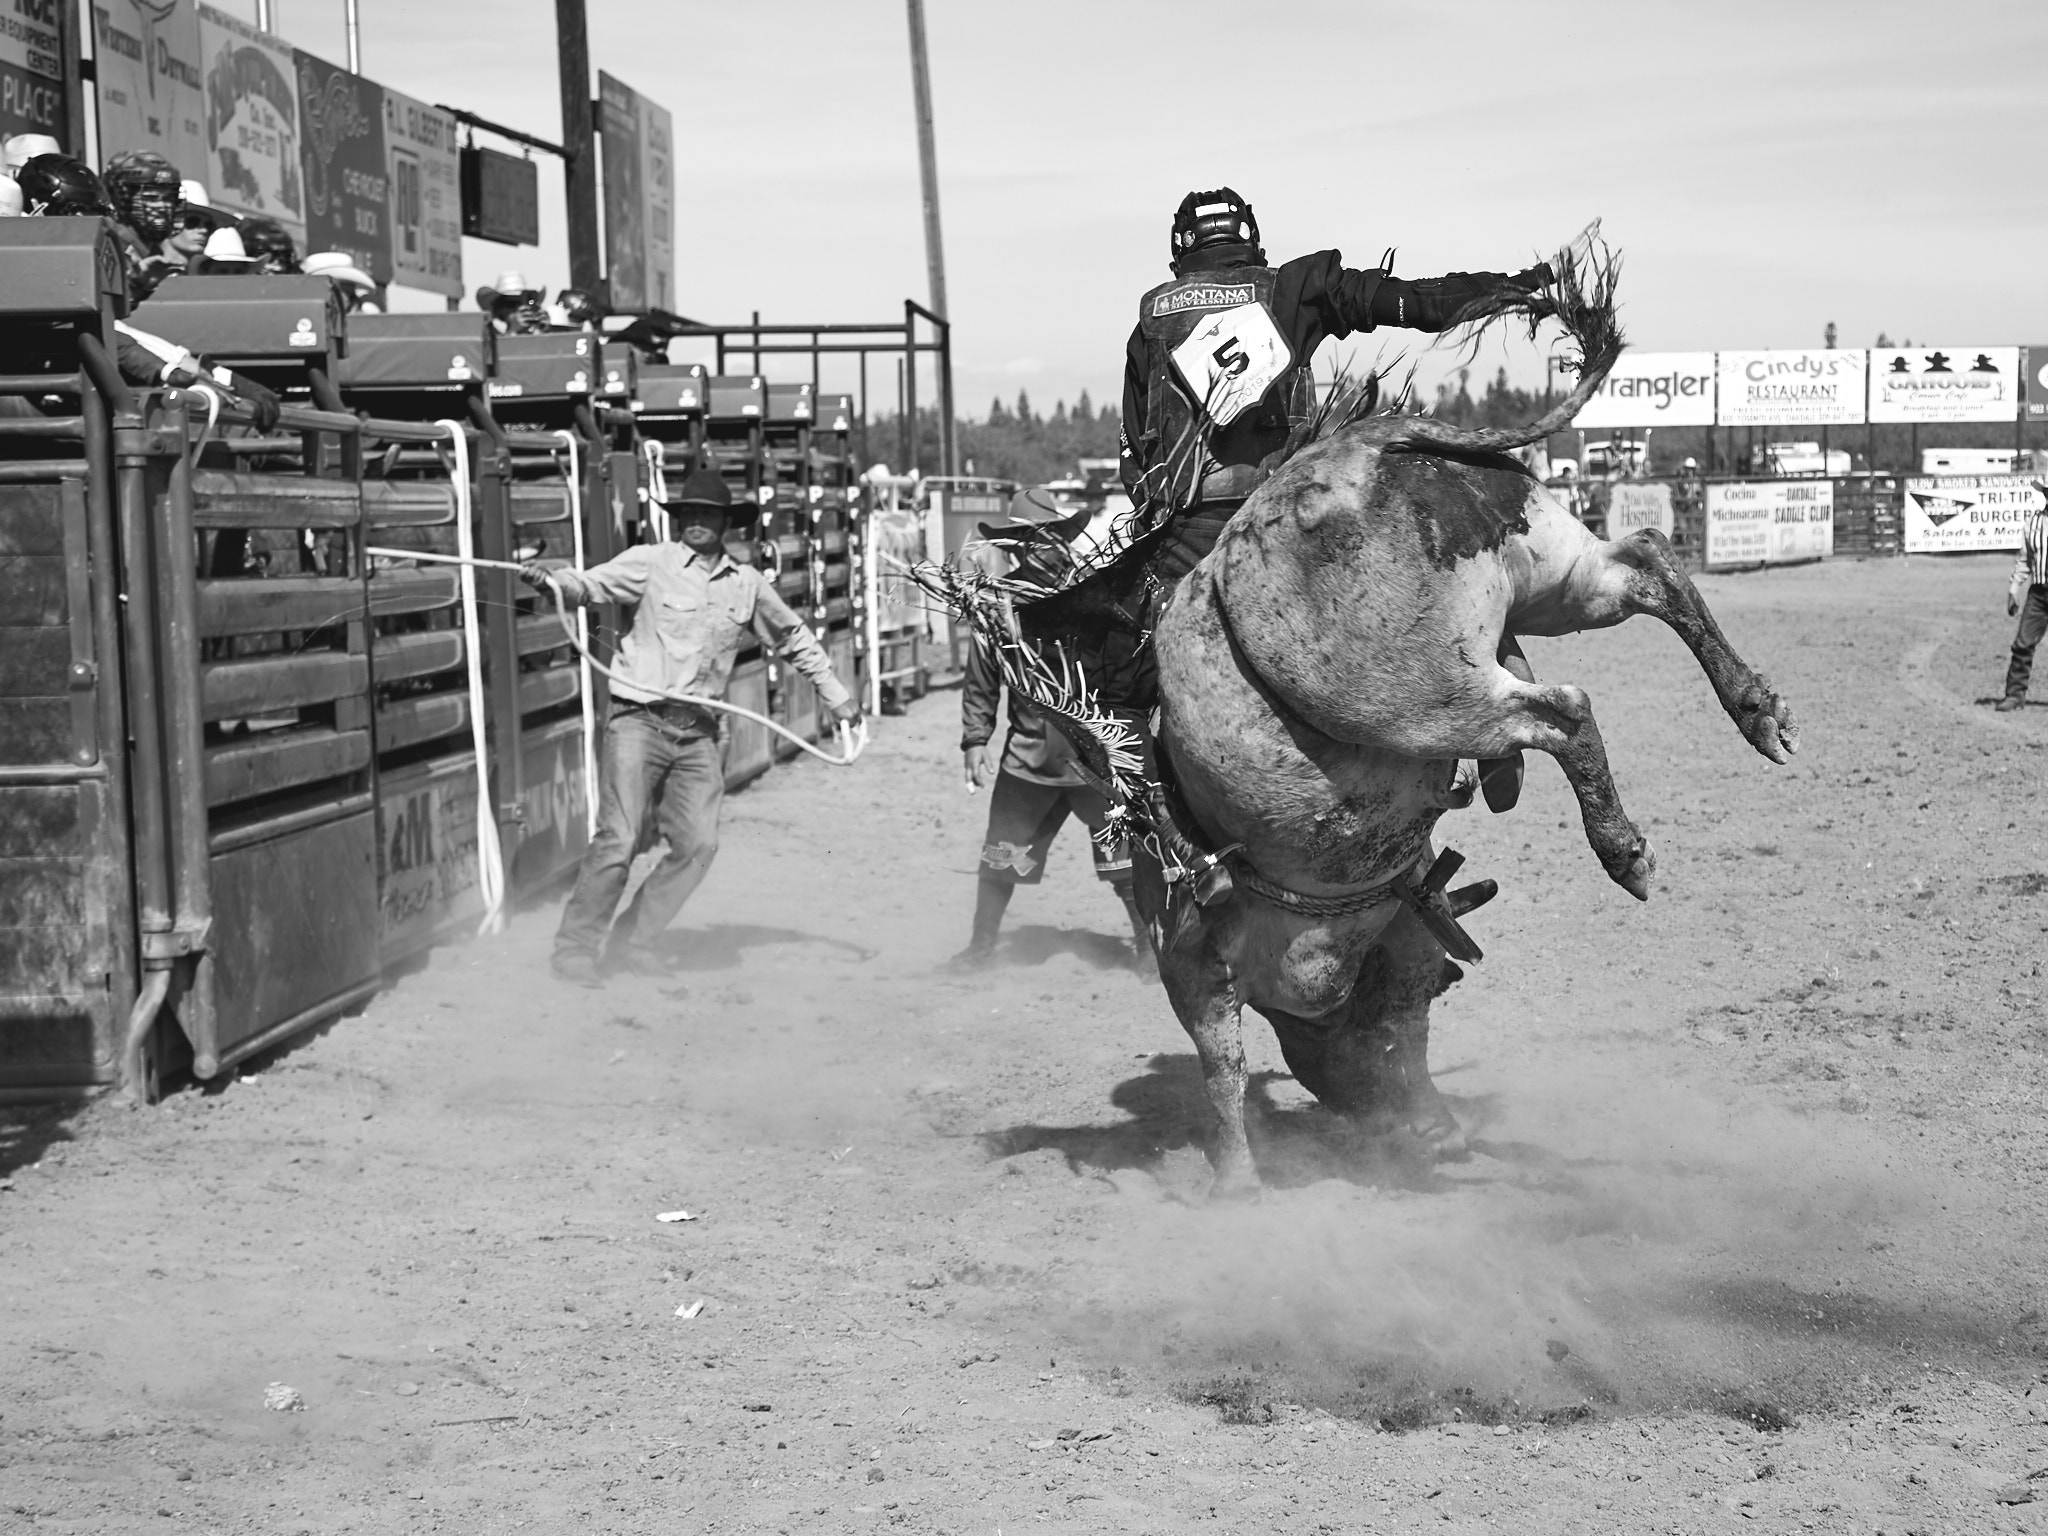 Rodeo_2019_1148.jpg